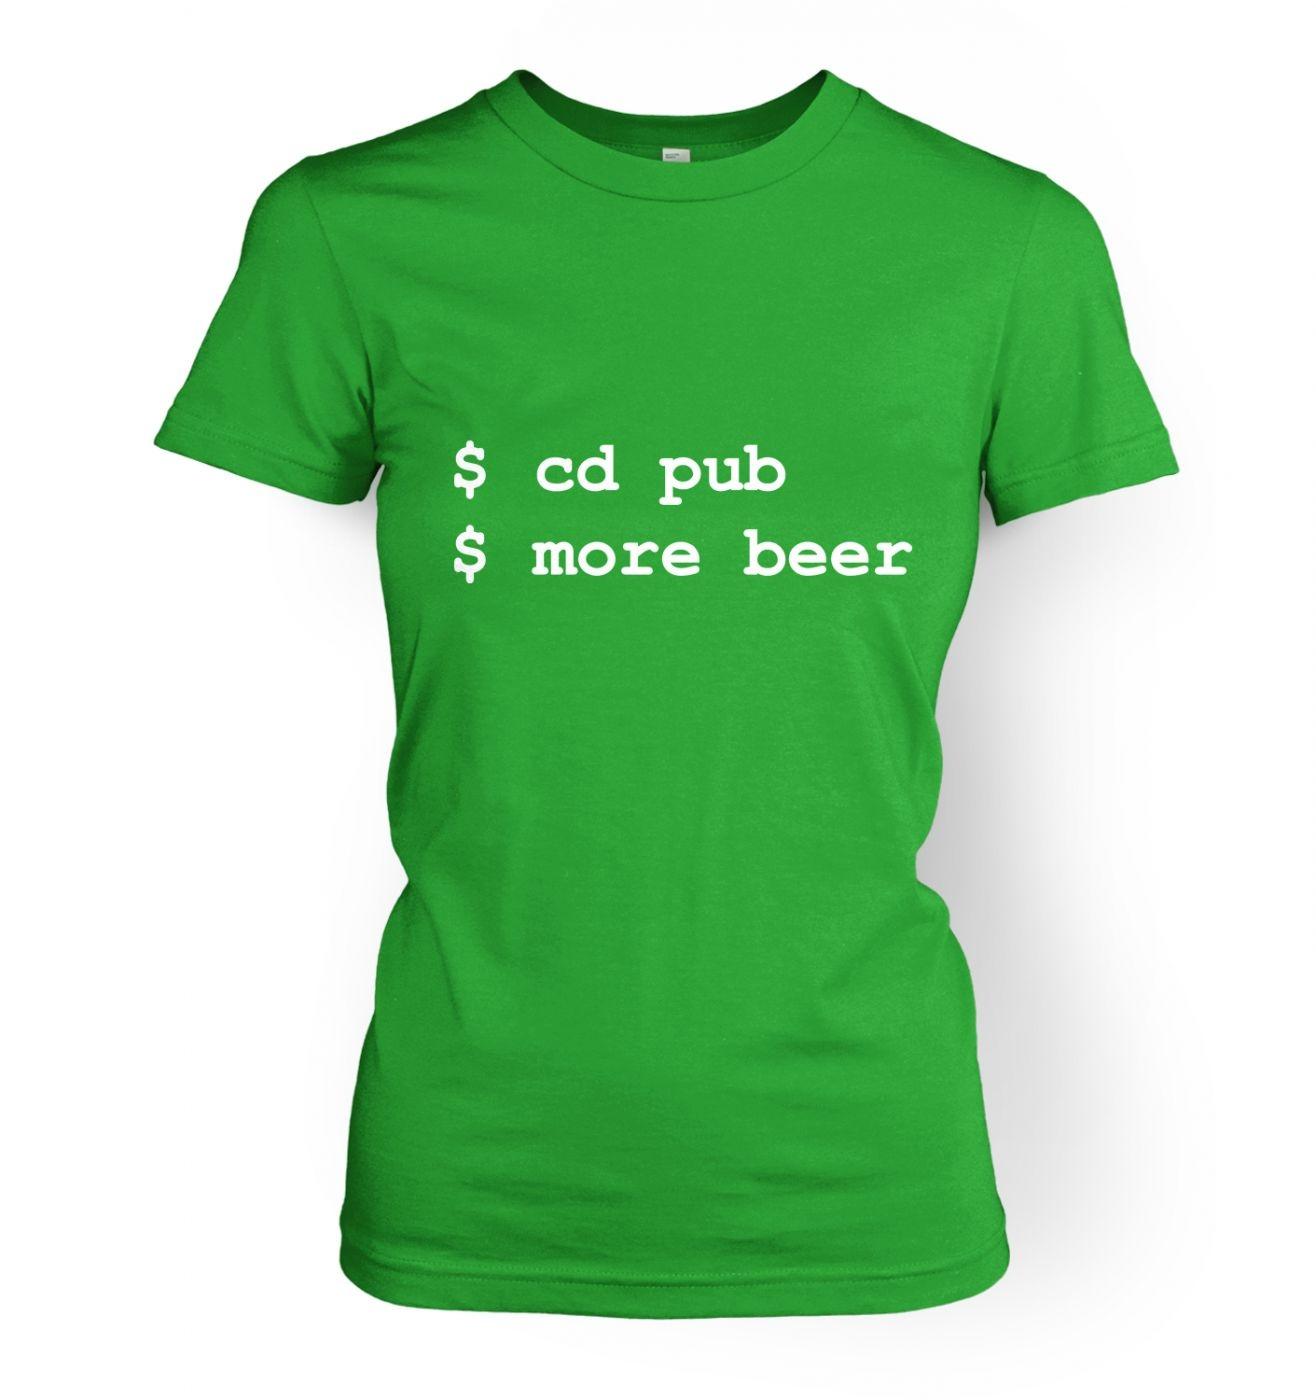 More Beer Linux women's t-shirt